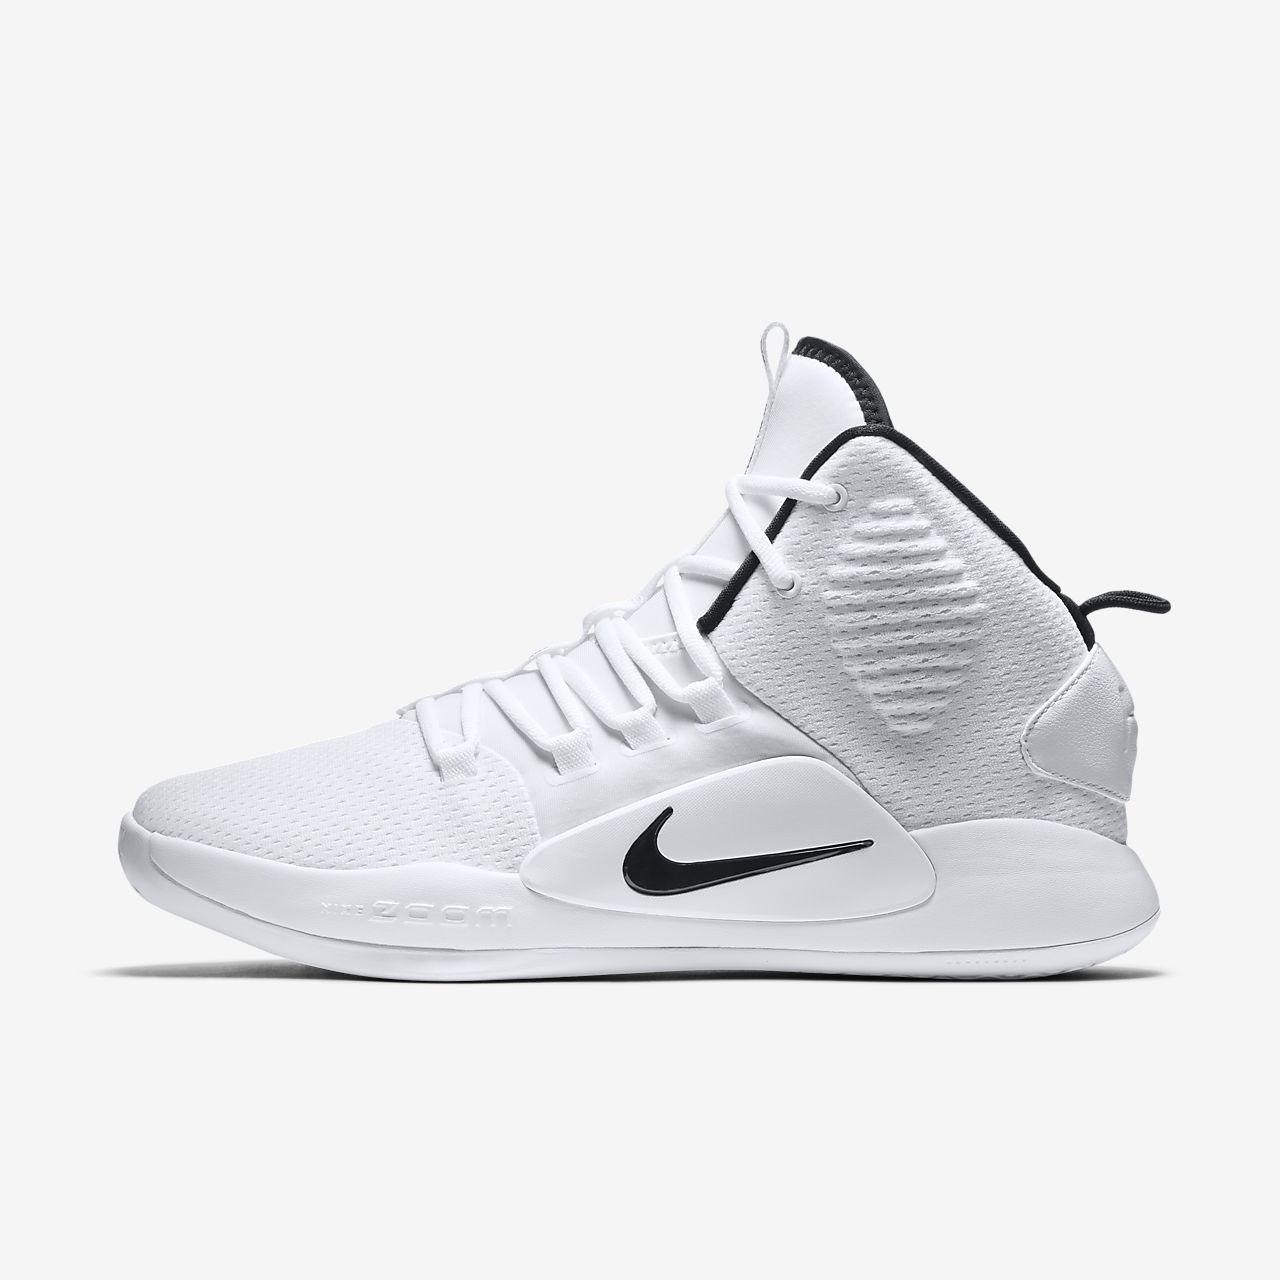 a792501e496 Nike Hyperdunk X TB Basketball Shoe. Nike.com IN